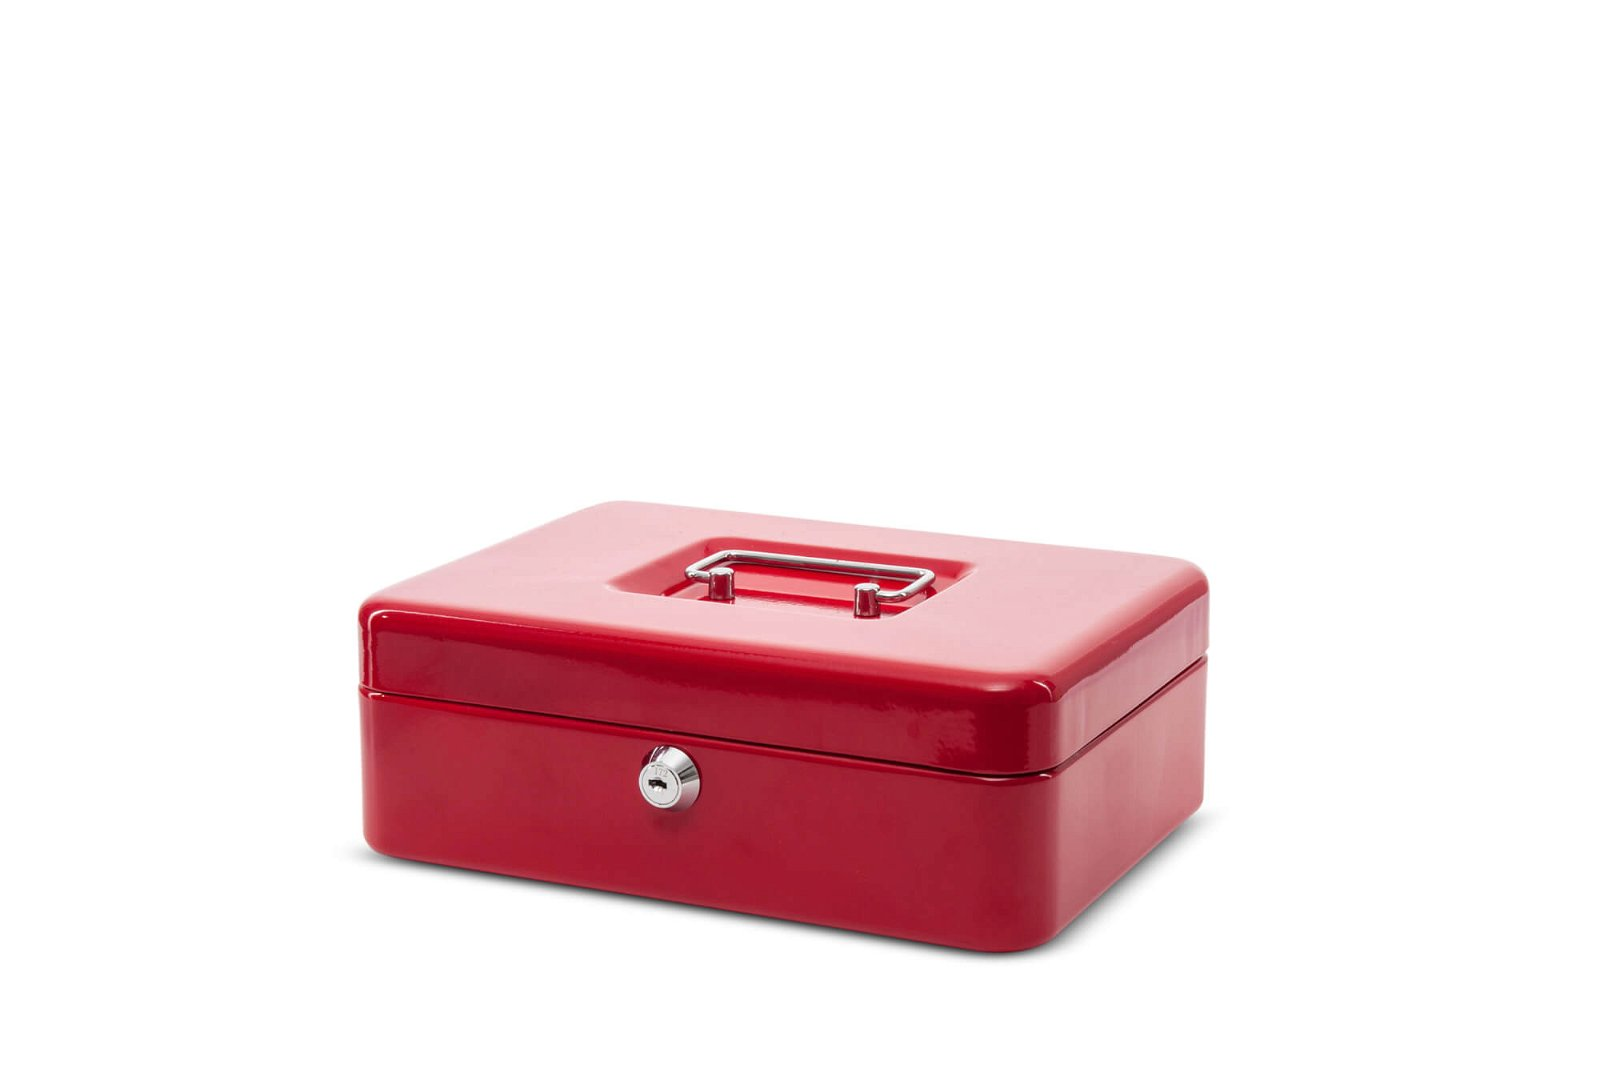 Geldkassette 3, 25 x 19,1 x 9 cm, rot